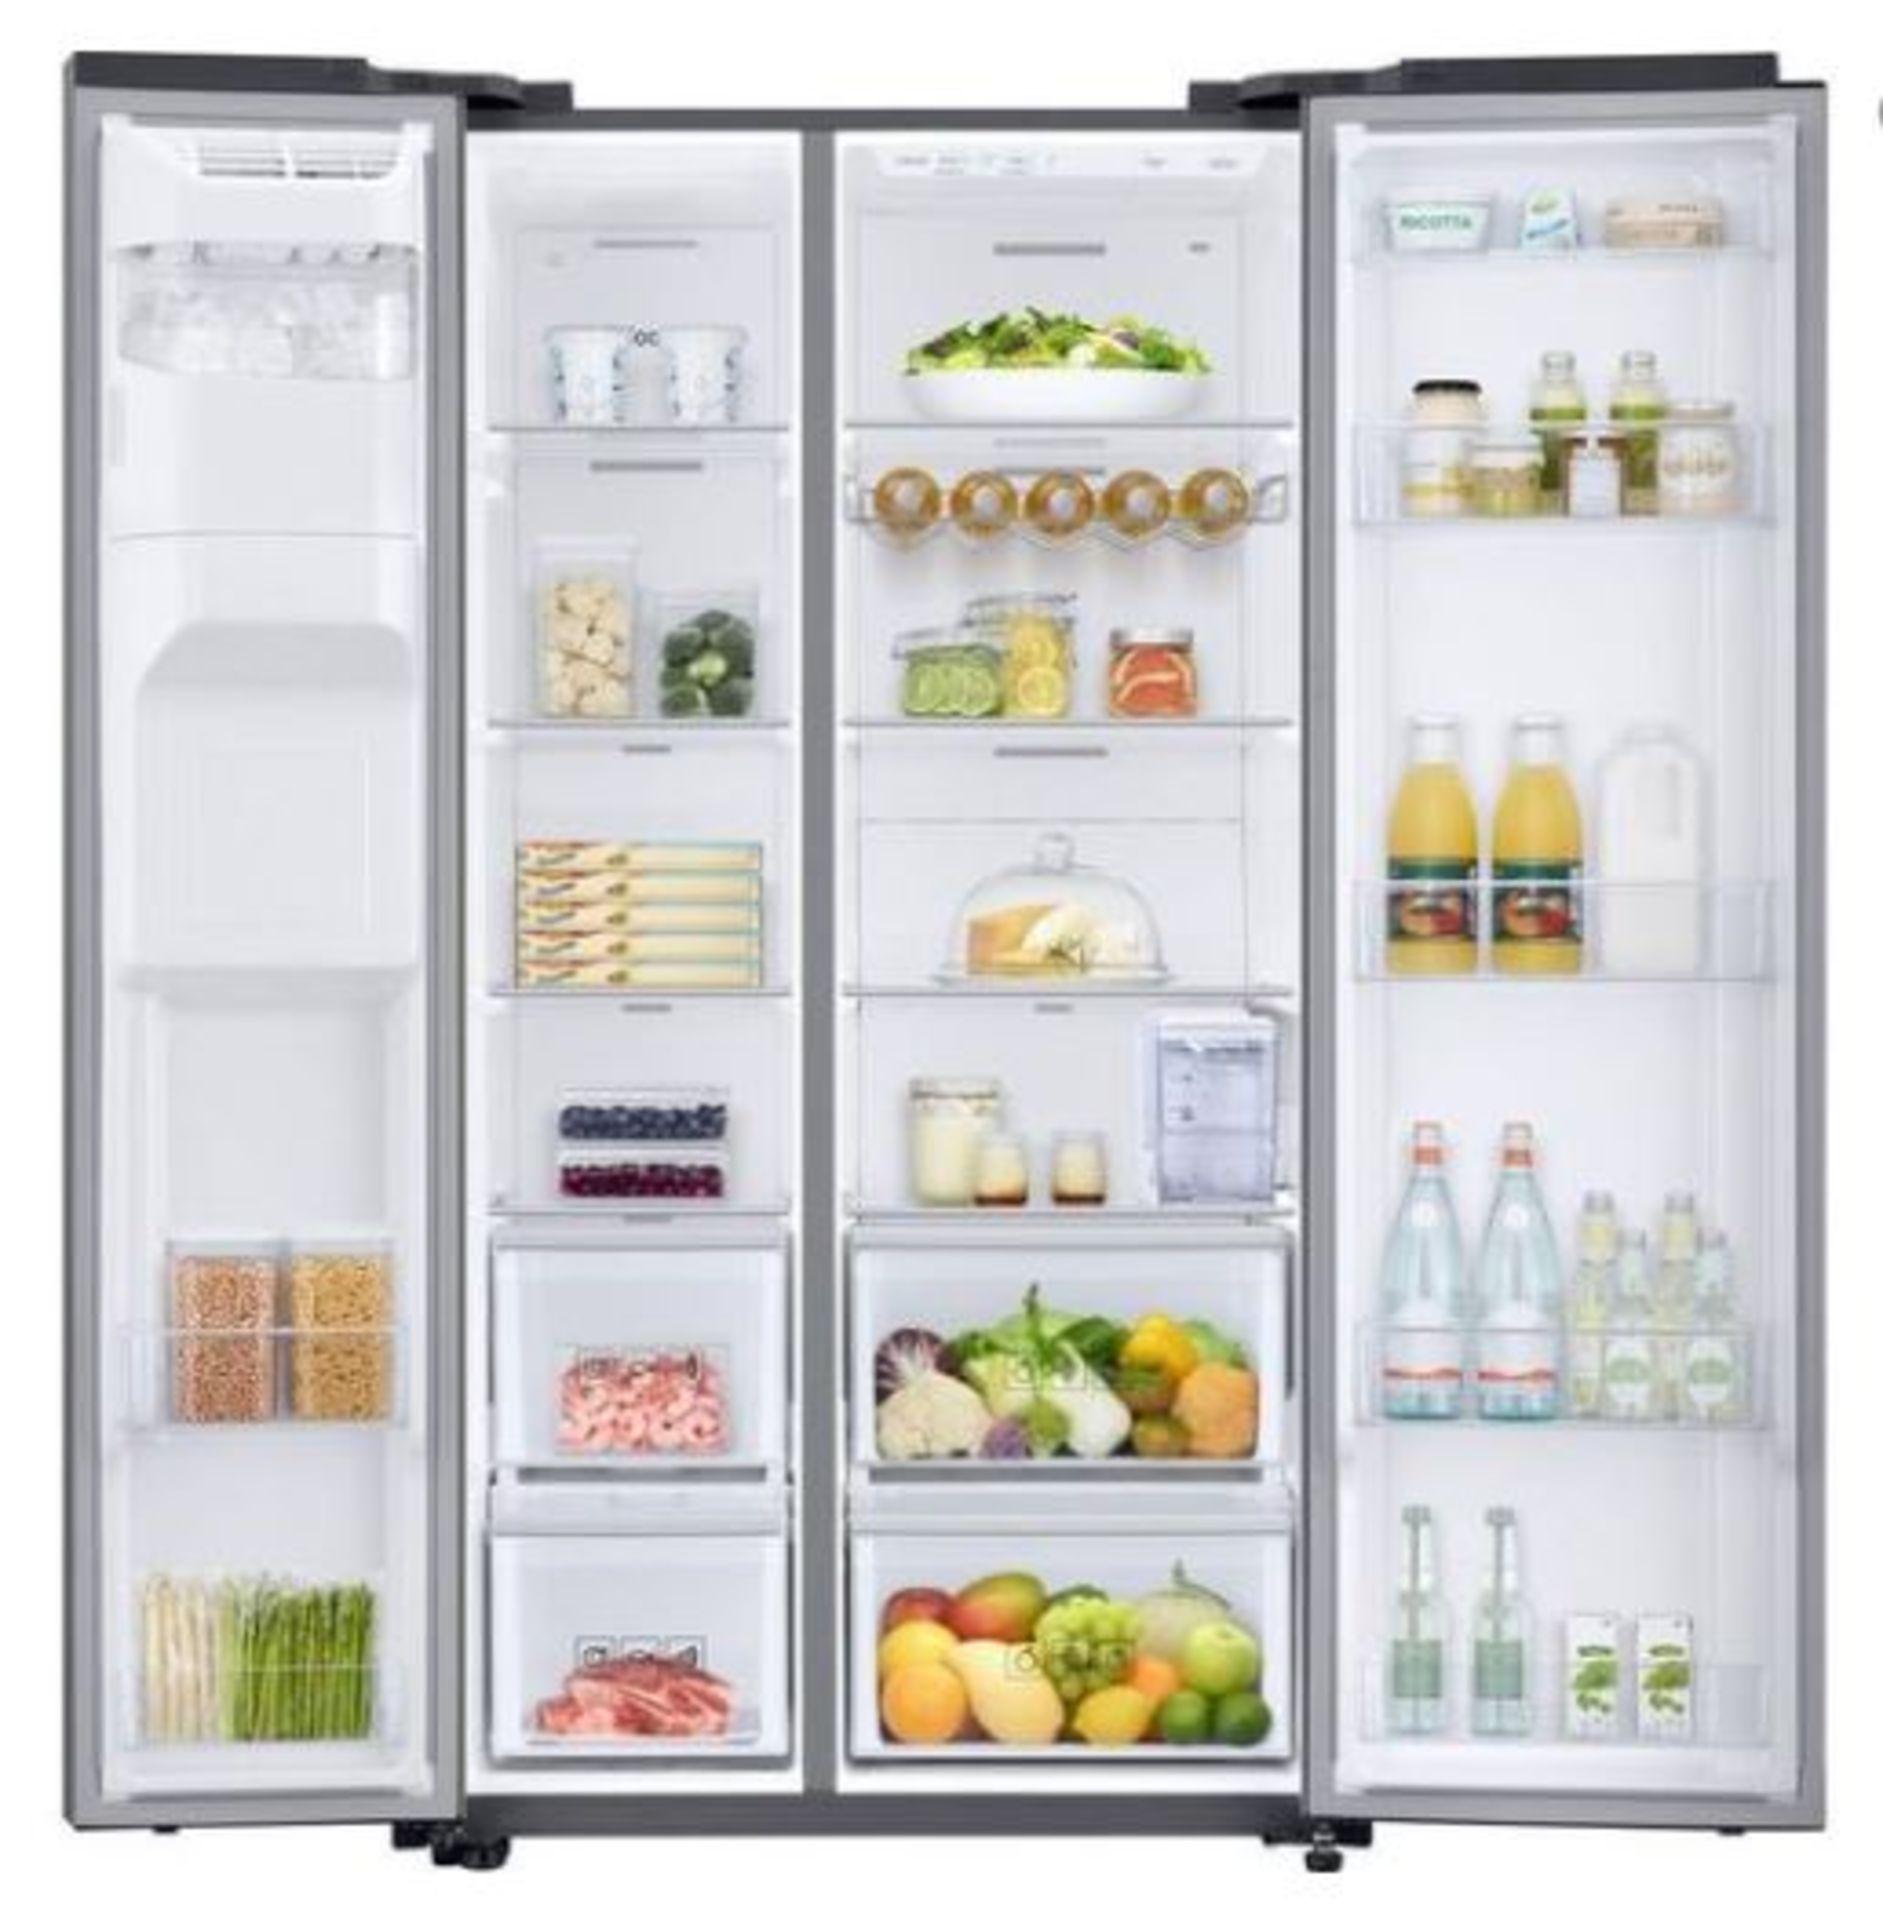 Pallet of 1 Samsung Water & Ice Fridge freezer. Latest selling price £1,329.99* - Image 2 of 9